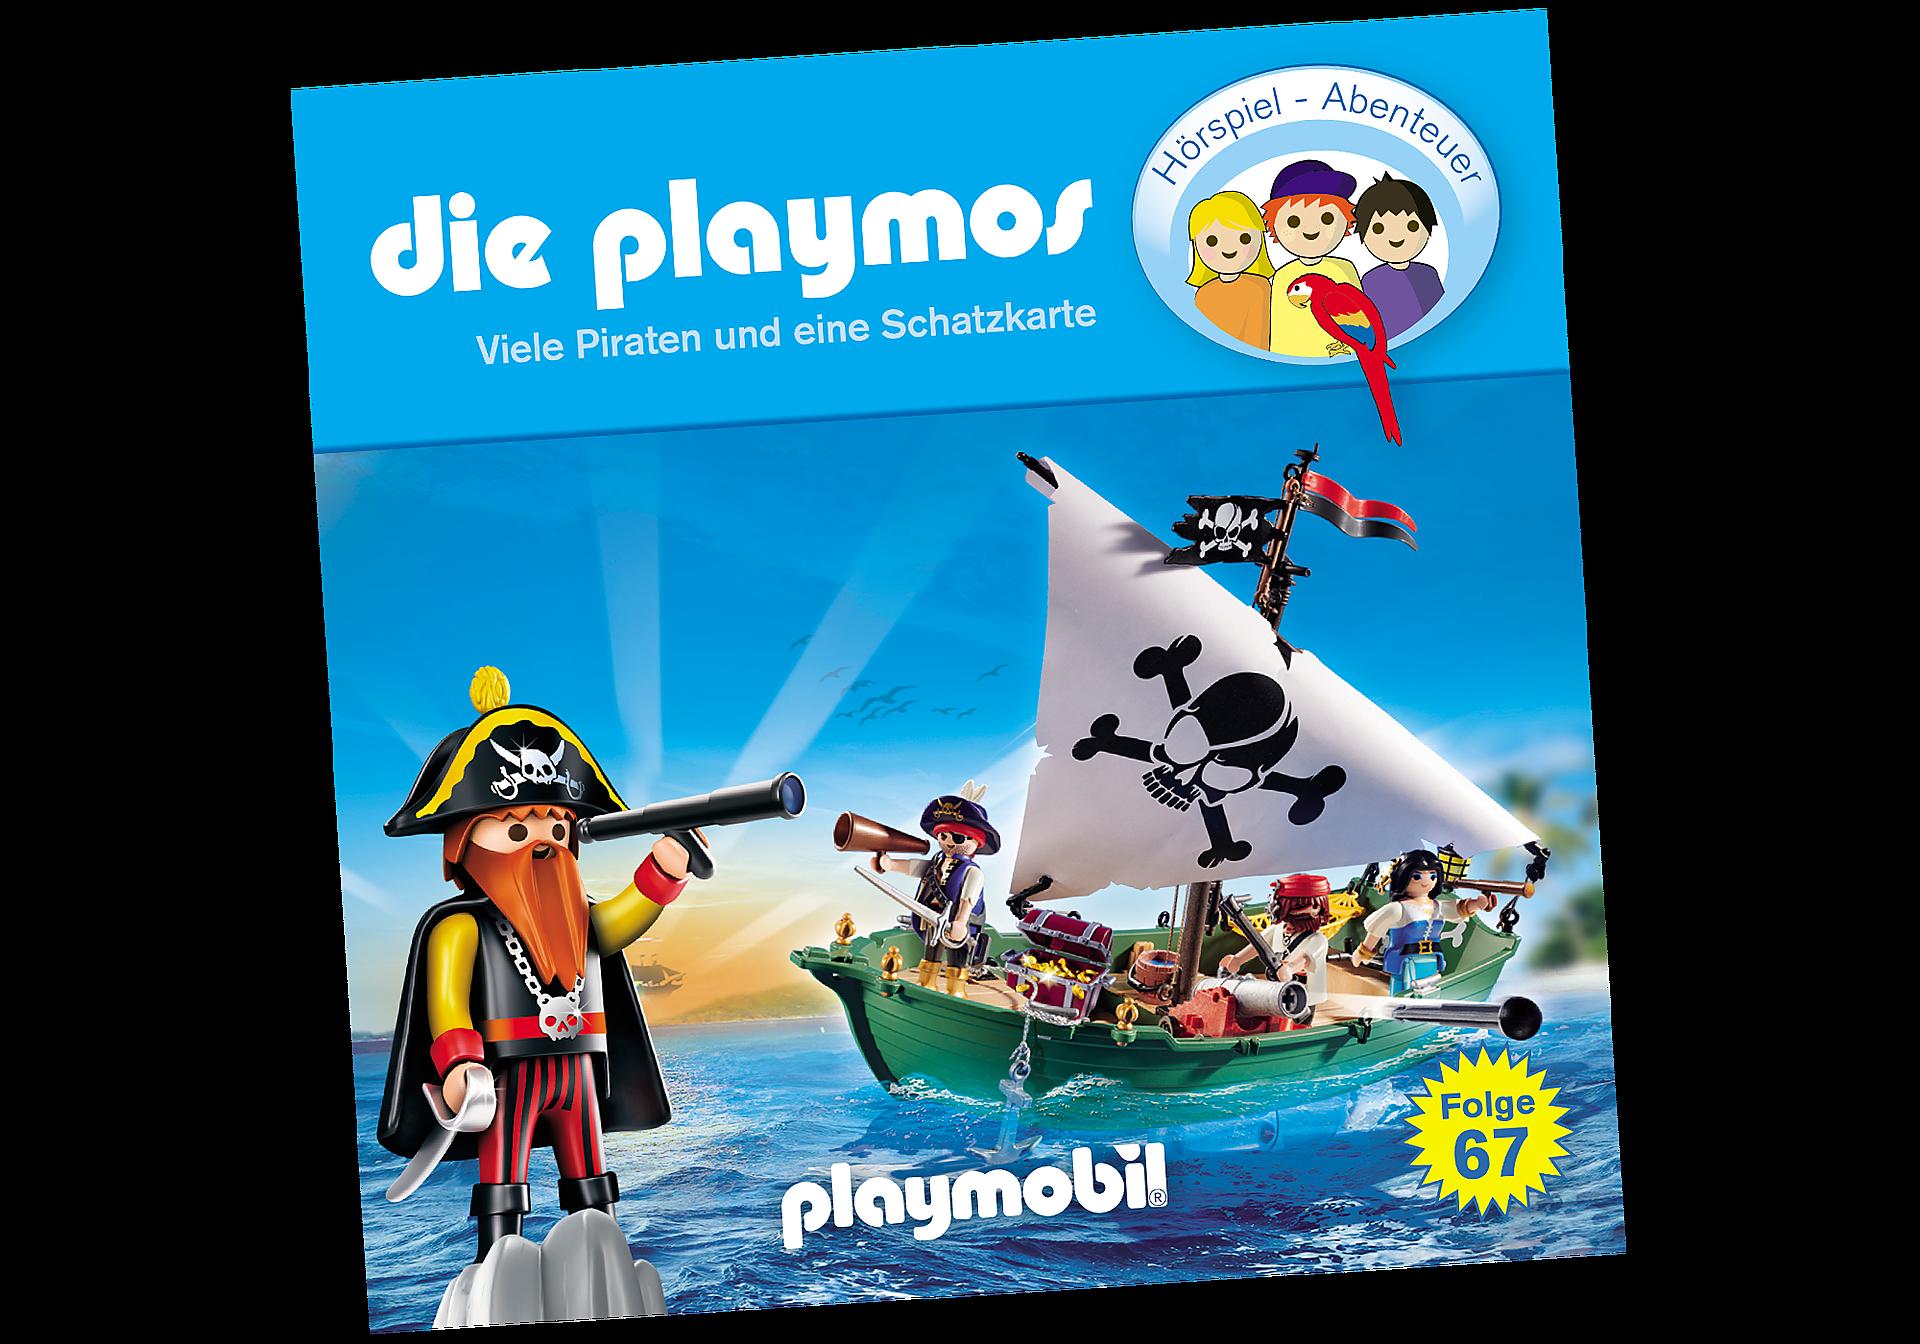 http://media.playmobil.com/i/playmobil/80140_product_detail/Viele Piraten und eine Schatzkarte - Folge 67